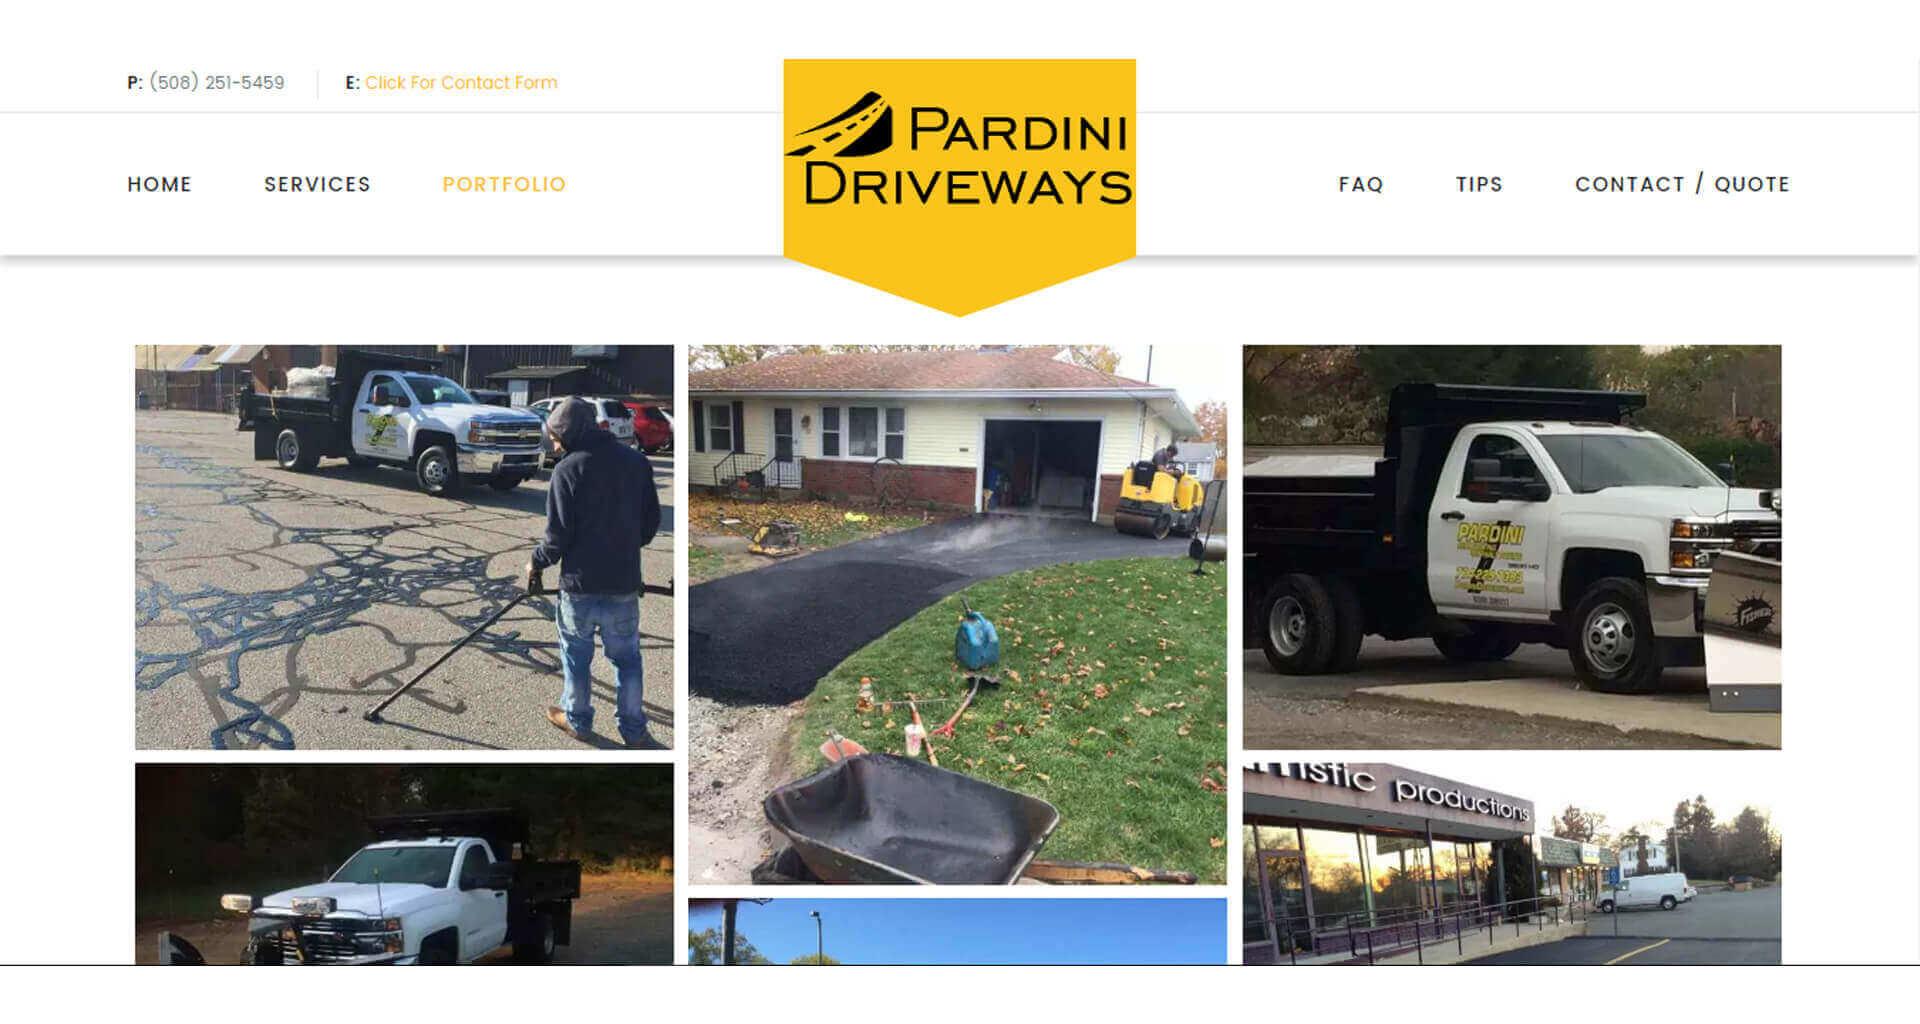 Pardini Driveways - Case Study